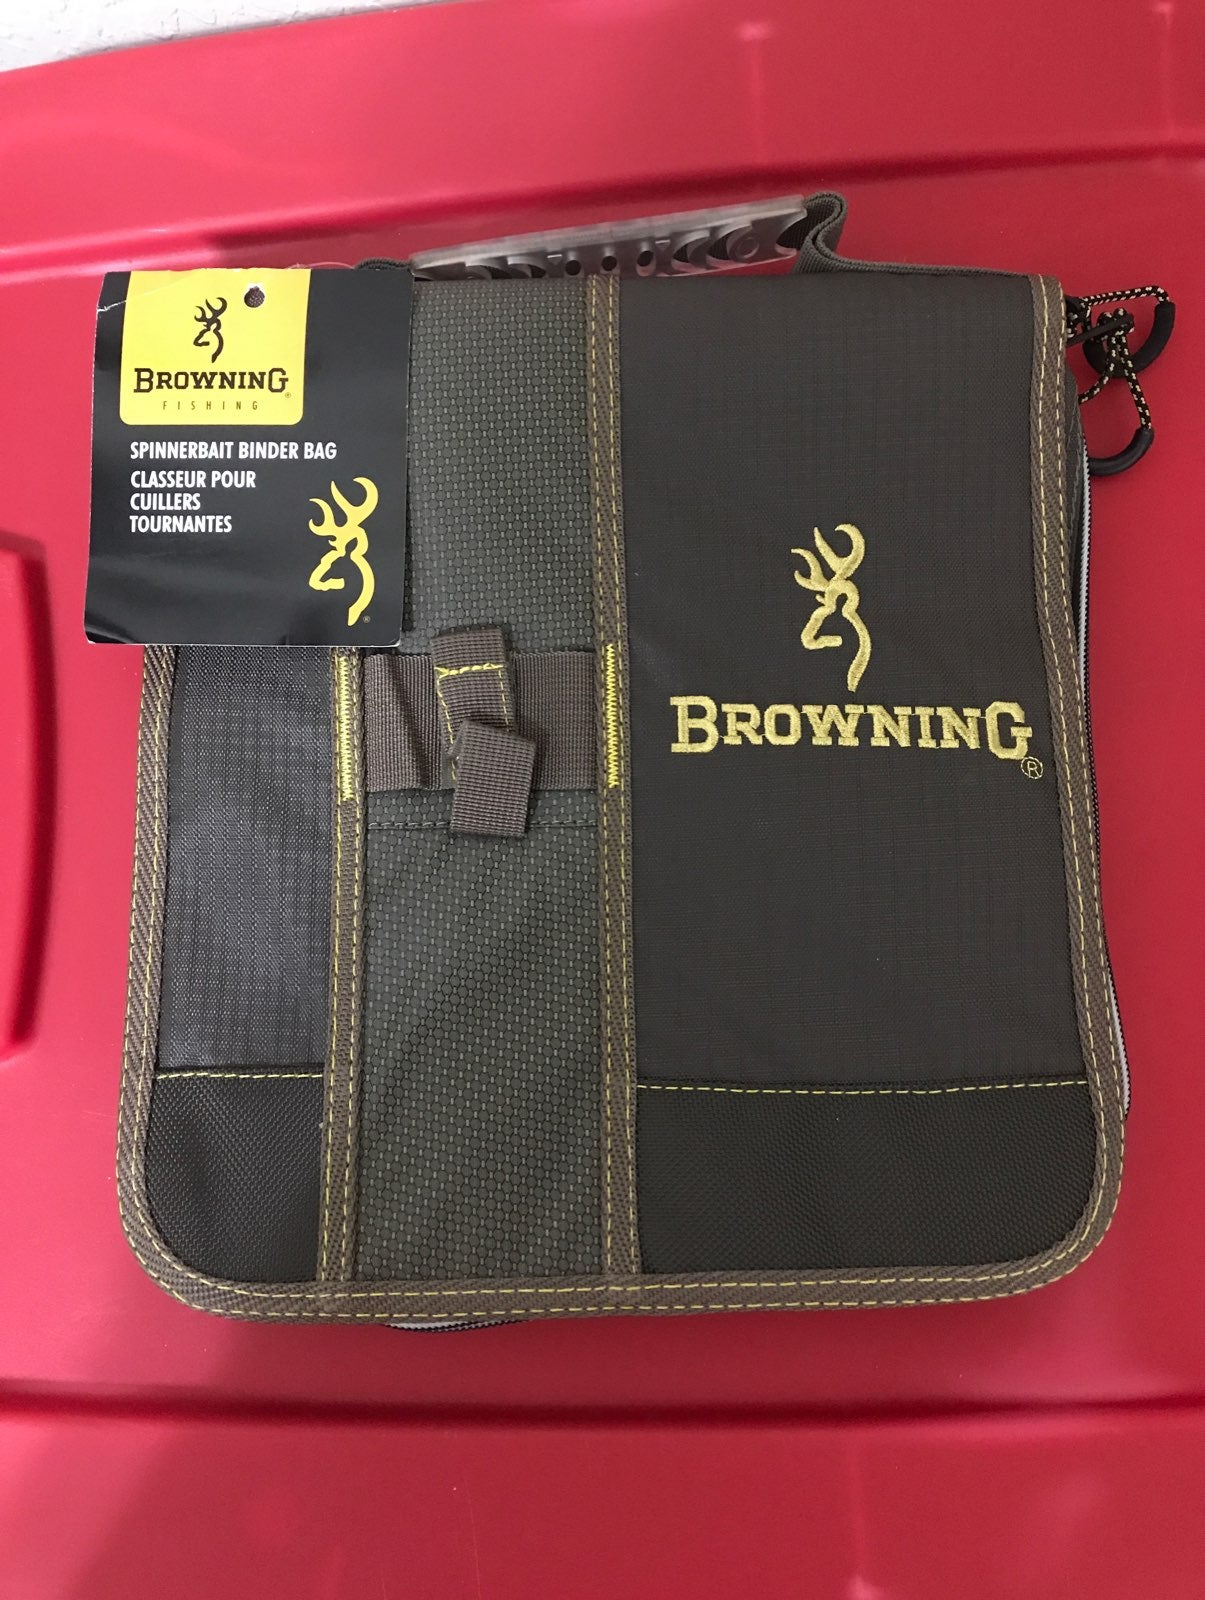 Browning Spinnerbait bag